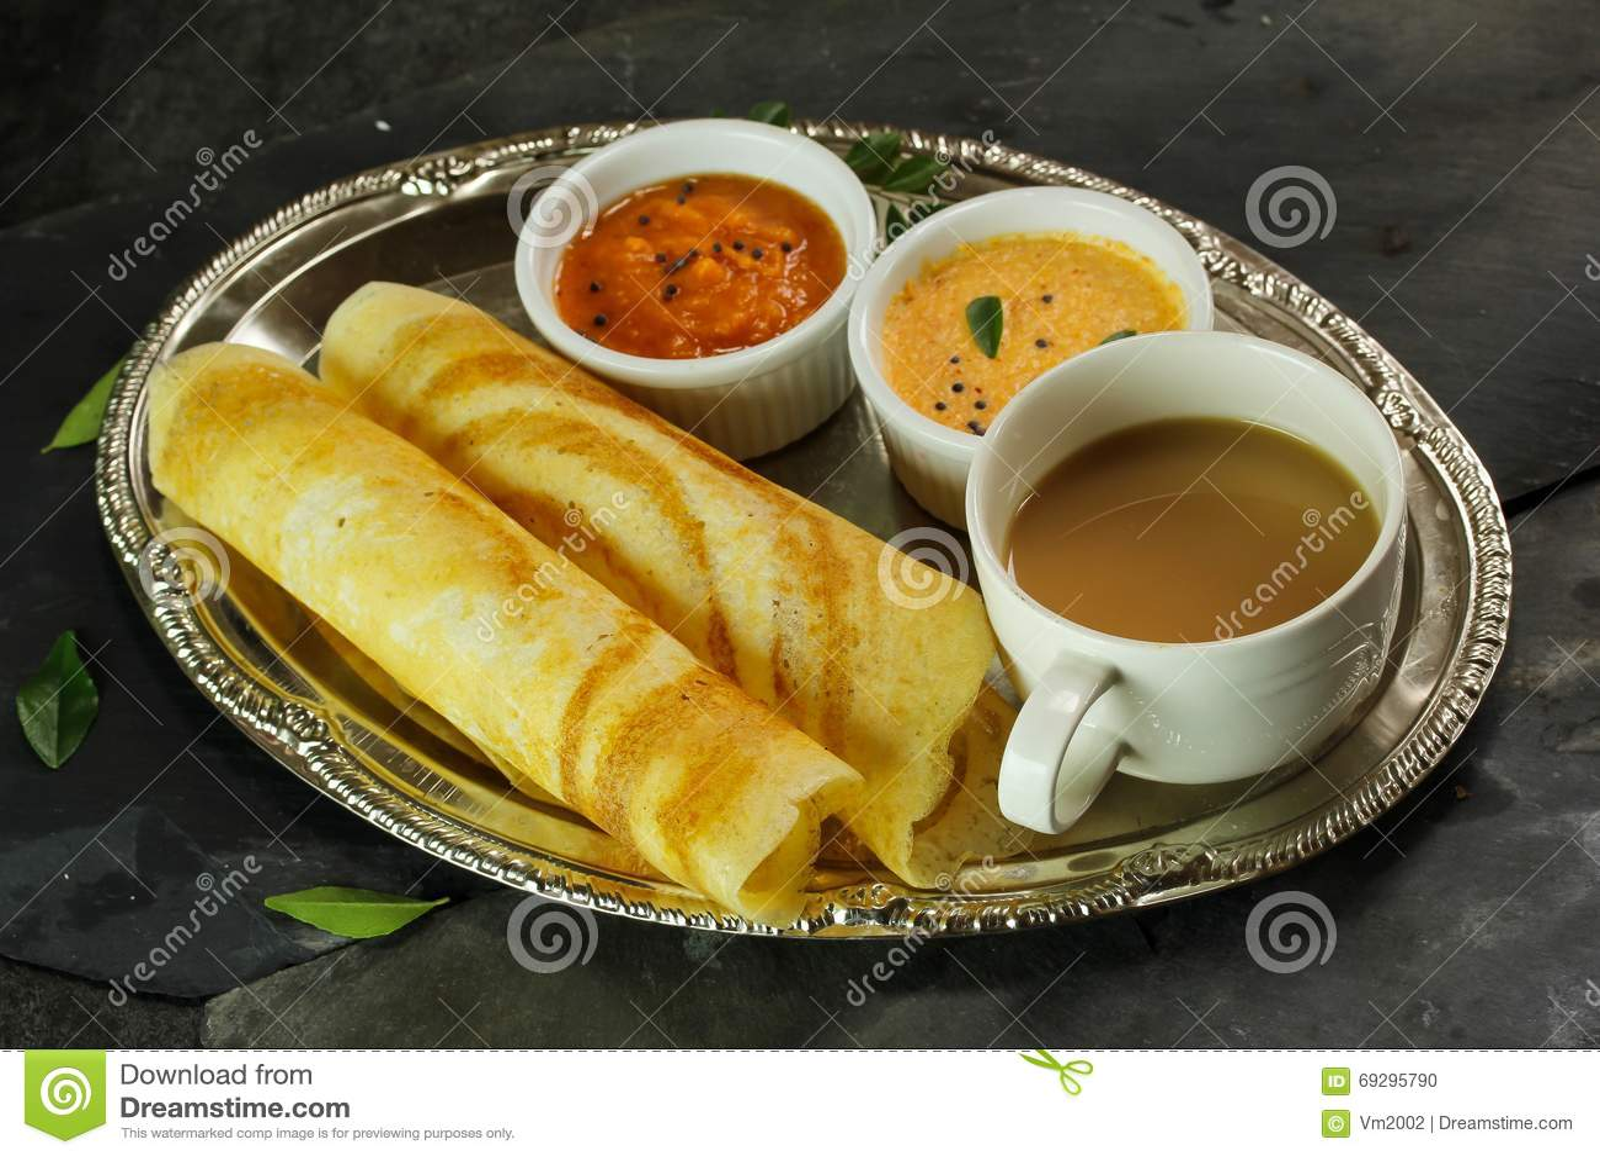 Dosa with Sambar and chutney, breakfast